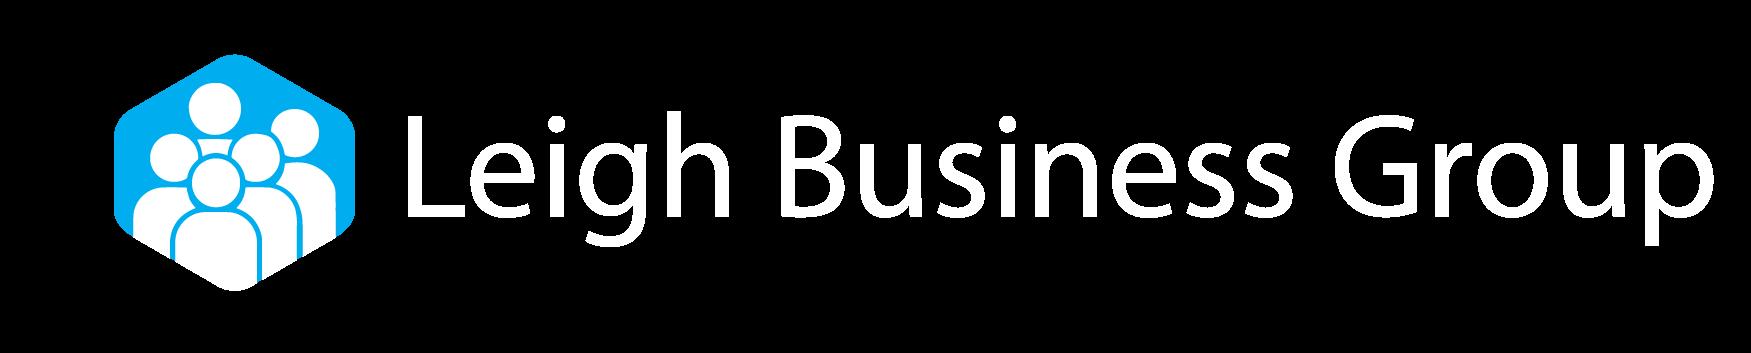 Leigh Business Group logo